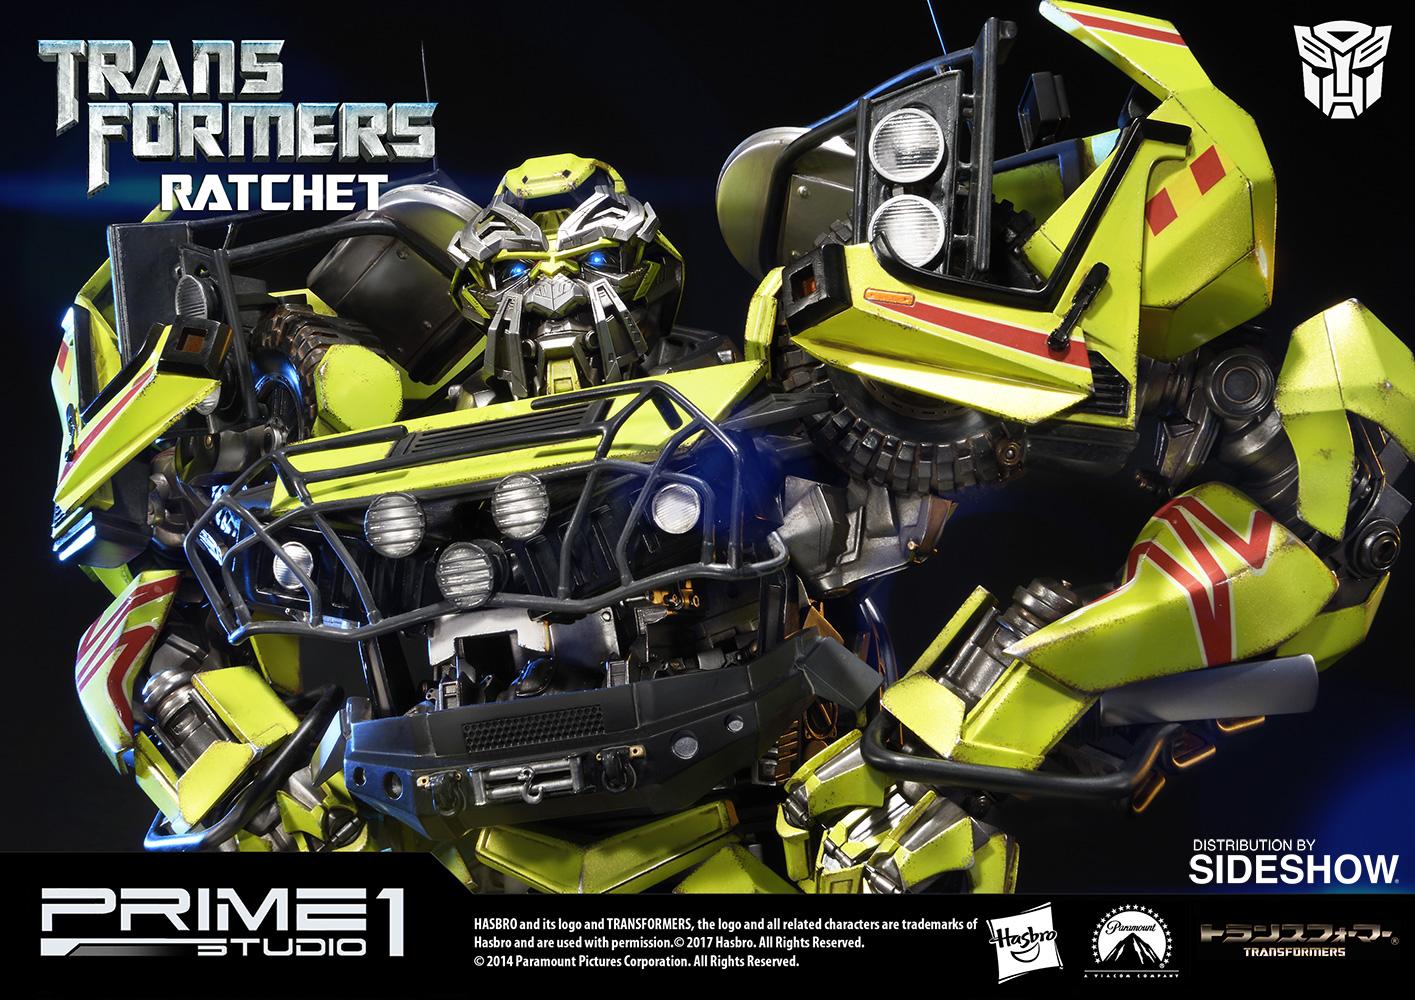 transformers ratchet polystone statueprime 1 studio | sideshow